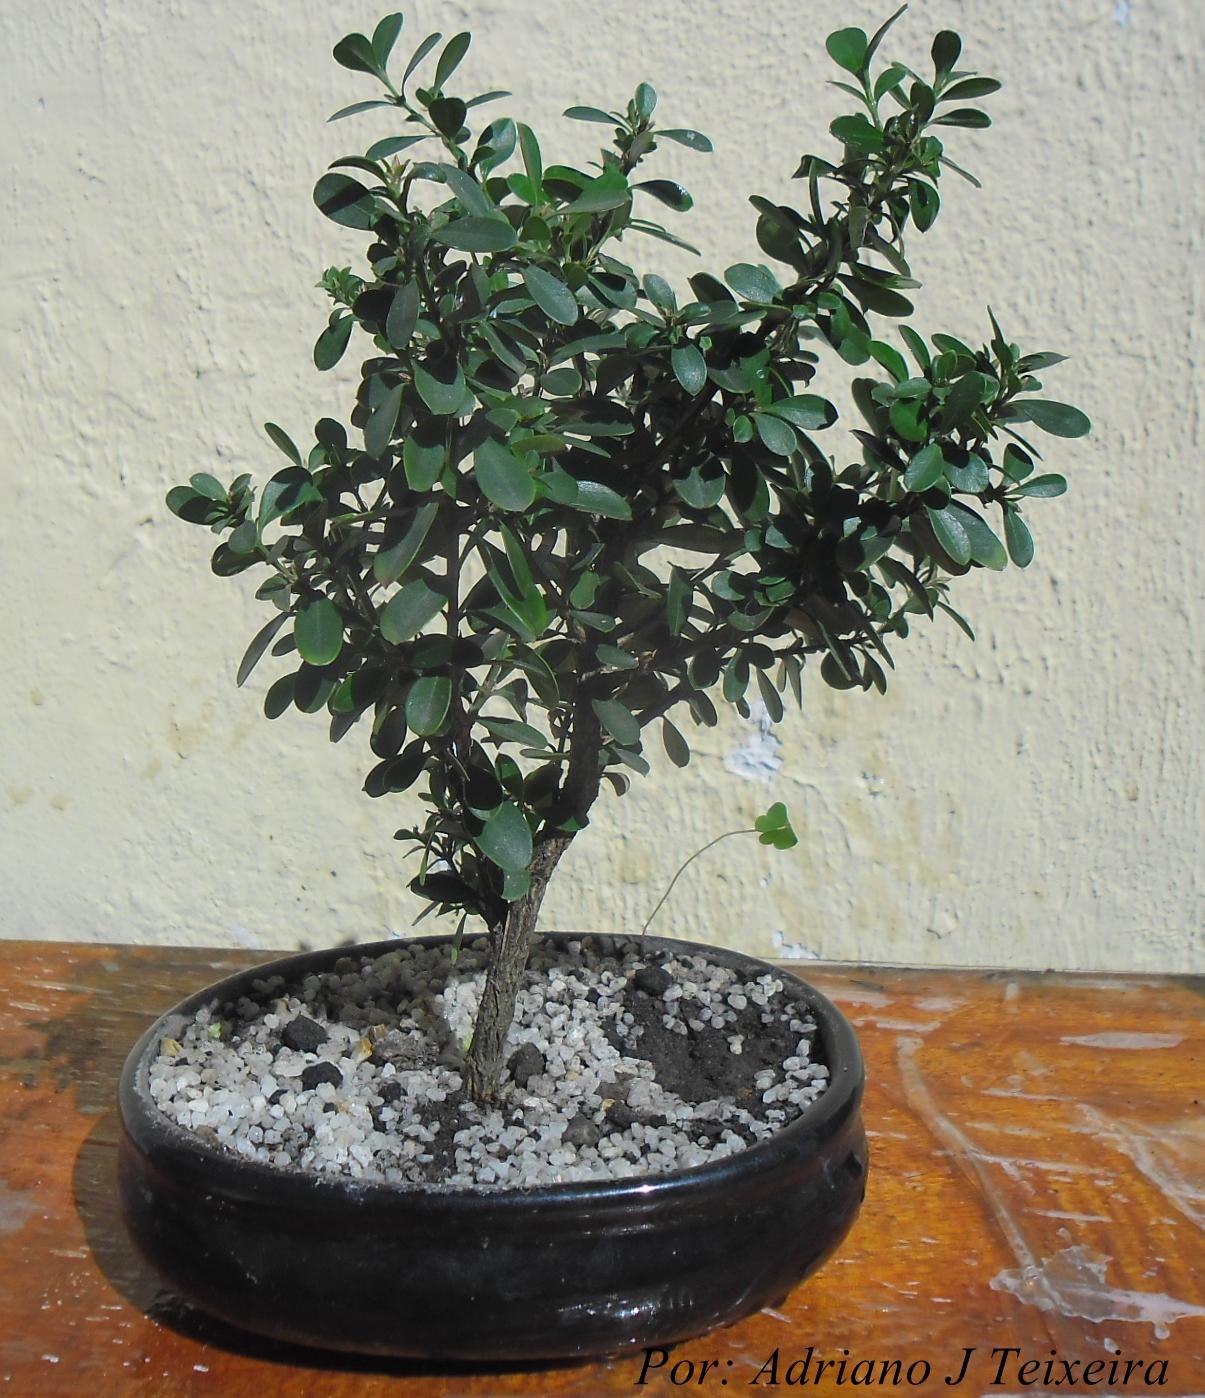 Mundo das plantas como cuidar e cultivar seu bonsai - Como cuidar bonsais ...